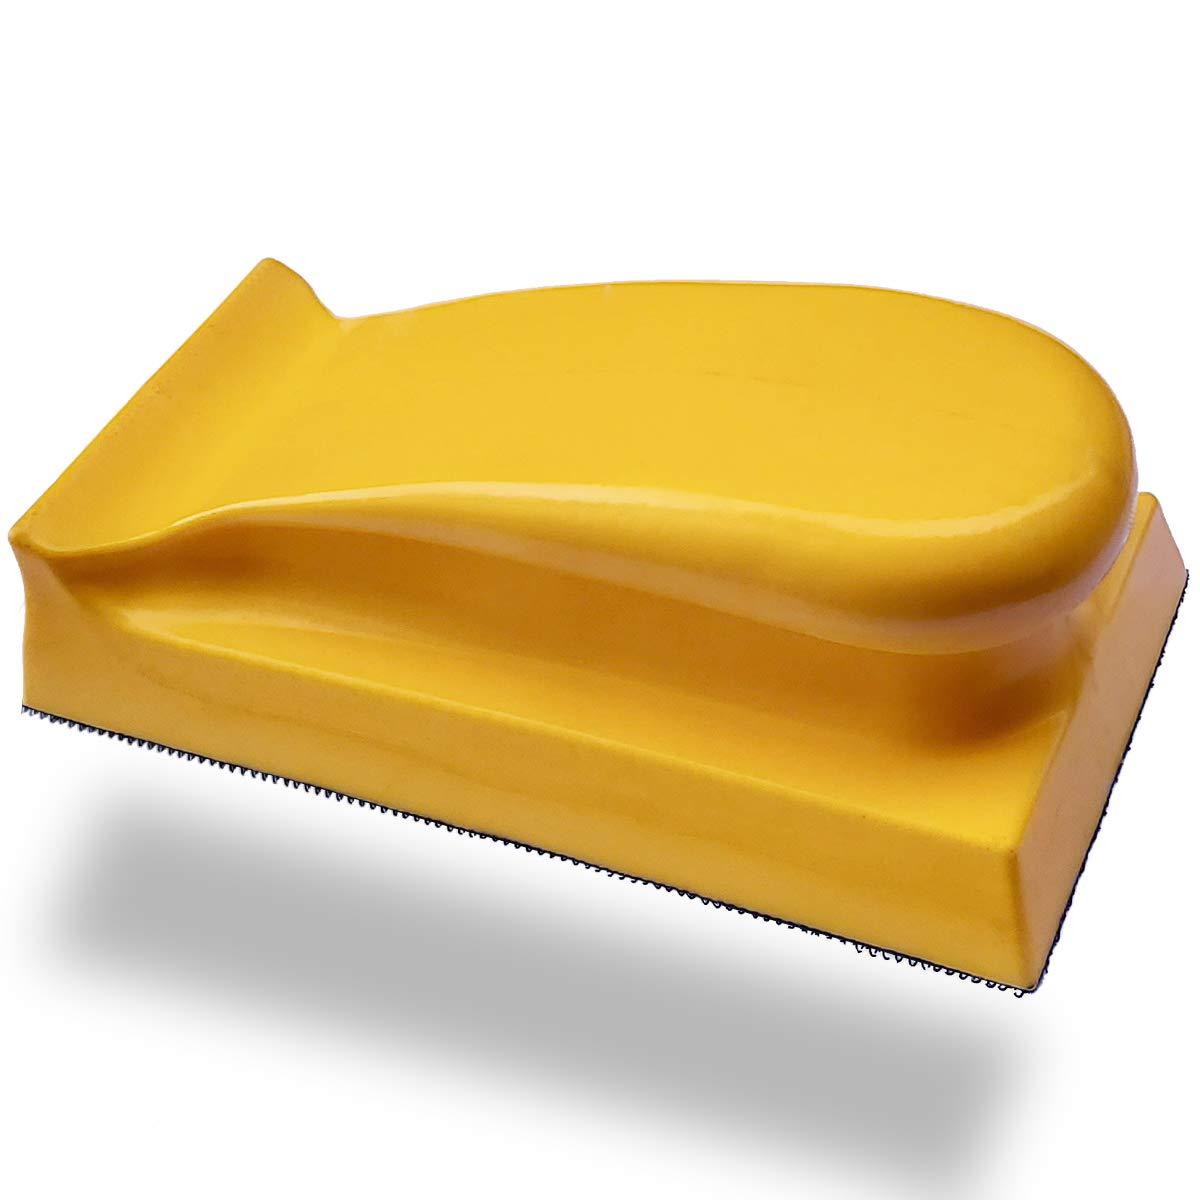 2-3//4 x 5 Sanding Block Hand Sander pads for hand Sanders or Polishers